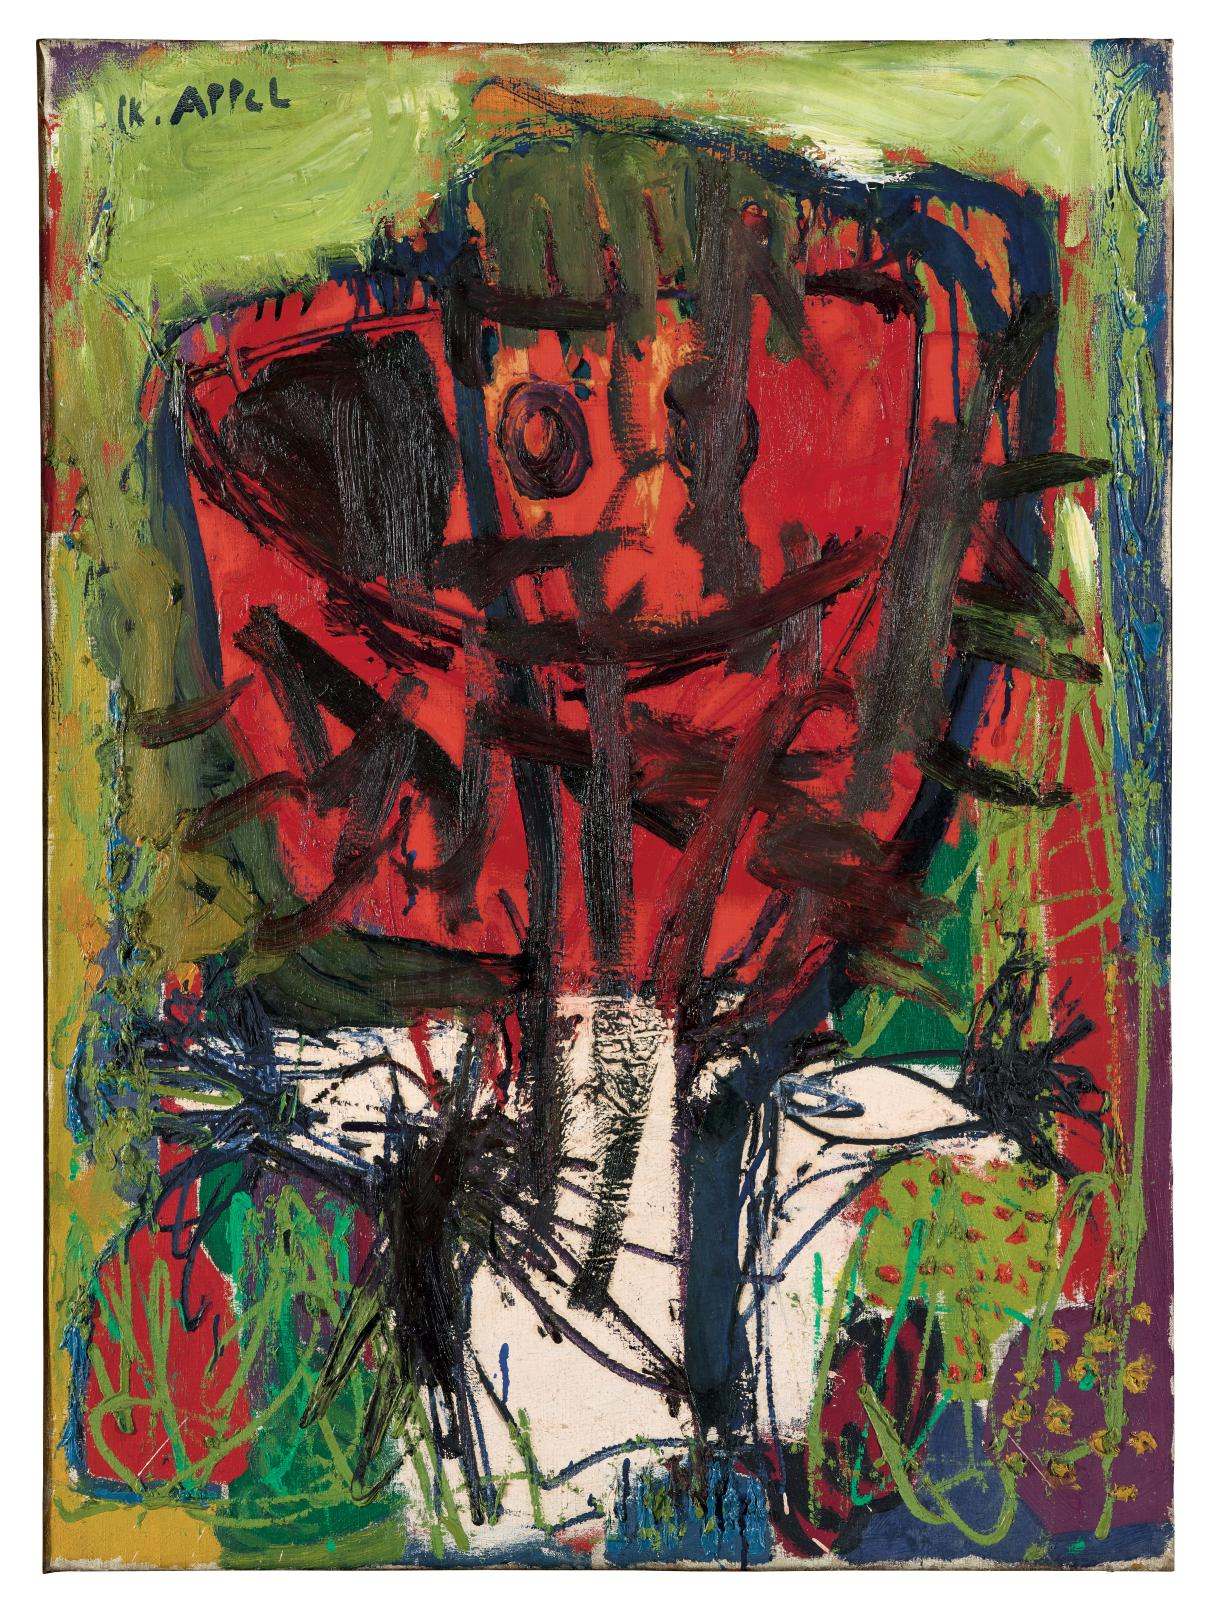 … Effroi dans l'herbe, 1947, huile sur toile, 95 x 70 cm, MAMVP. © KAREL APPEL FOUNDATION/ ADAGP, PARIS 2017